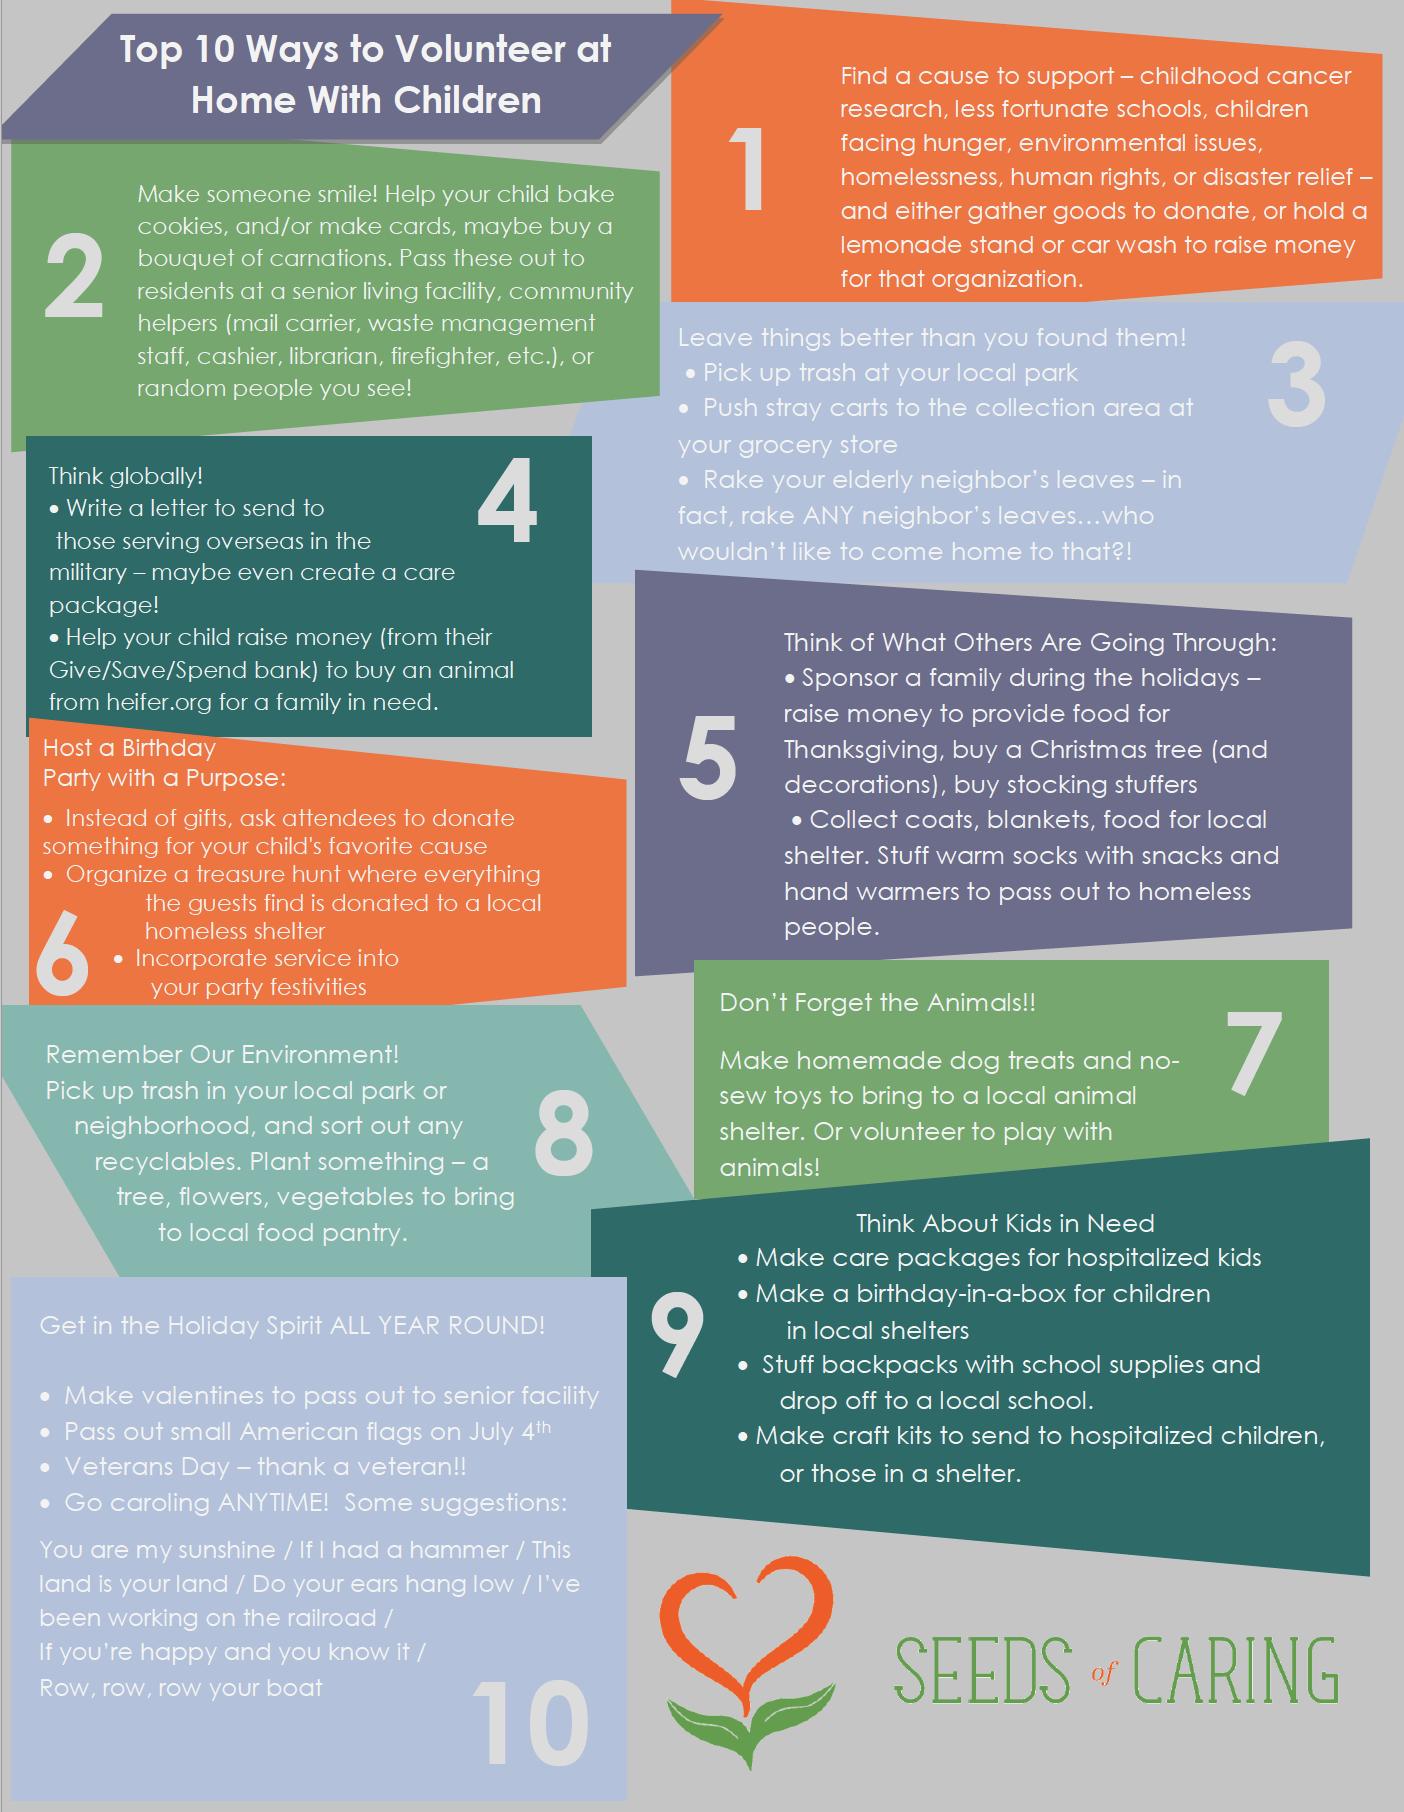 10 Ways to Volunteer at Home